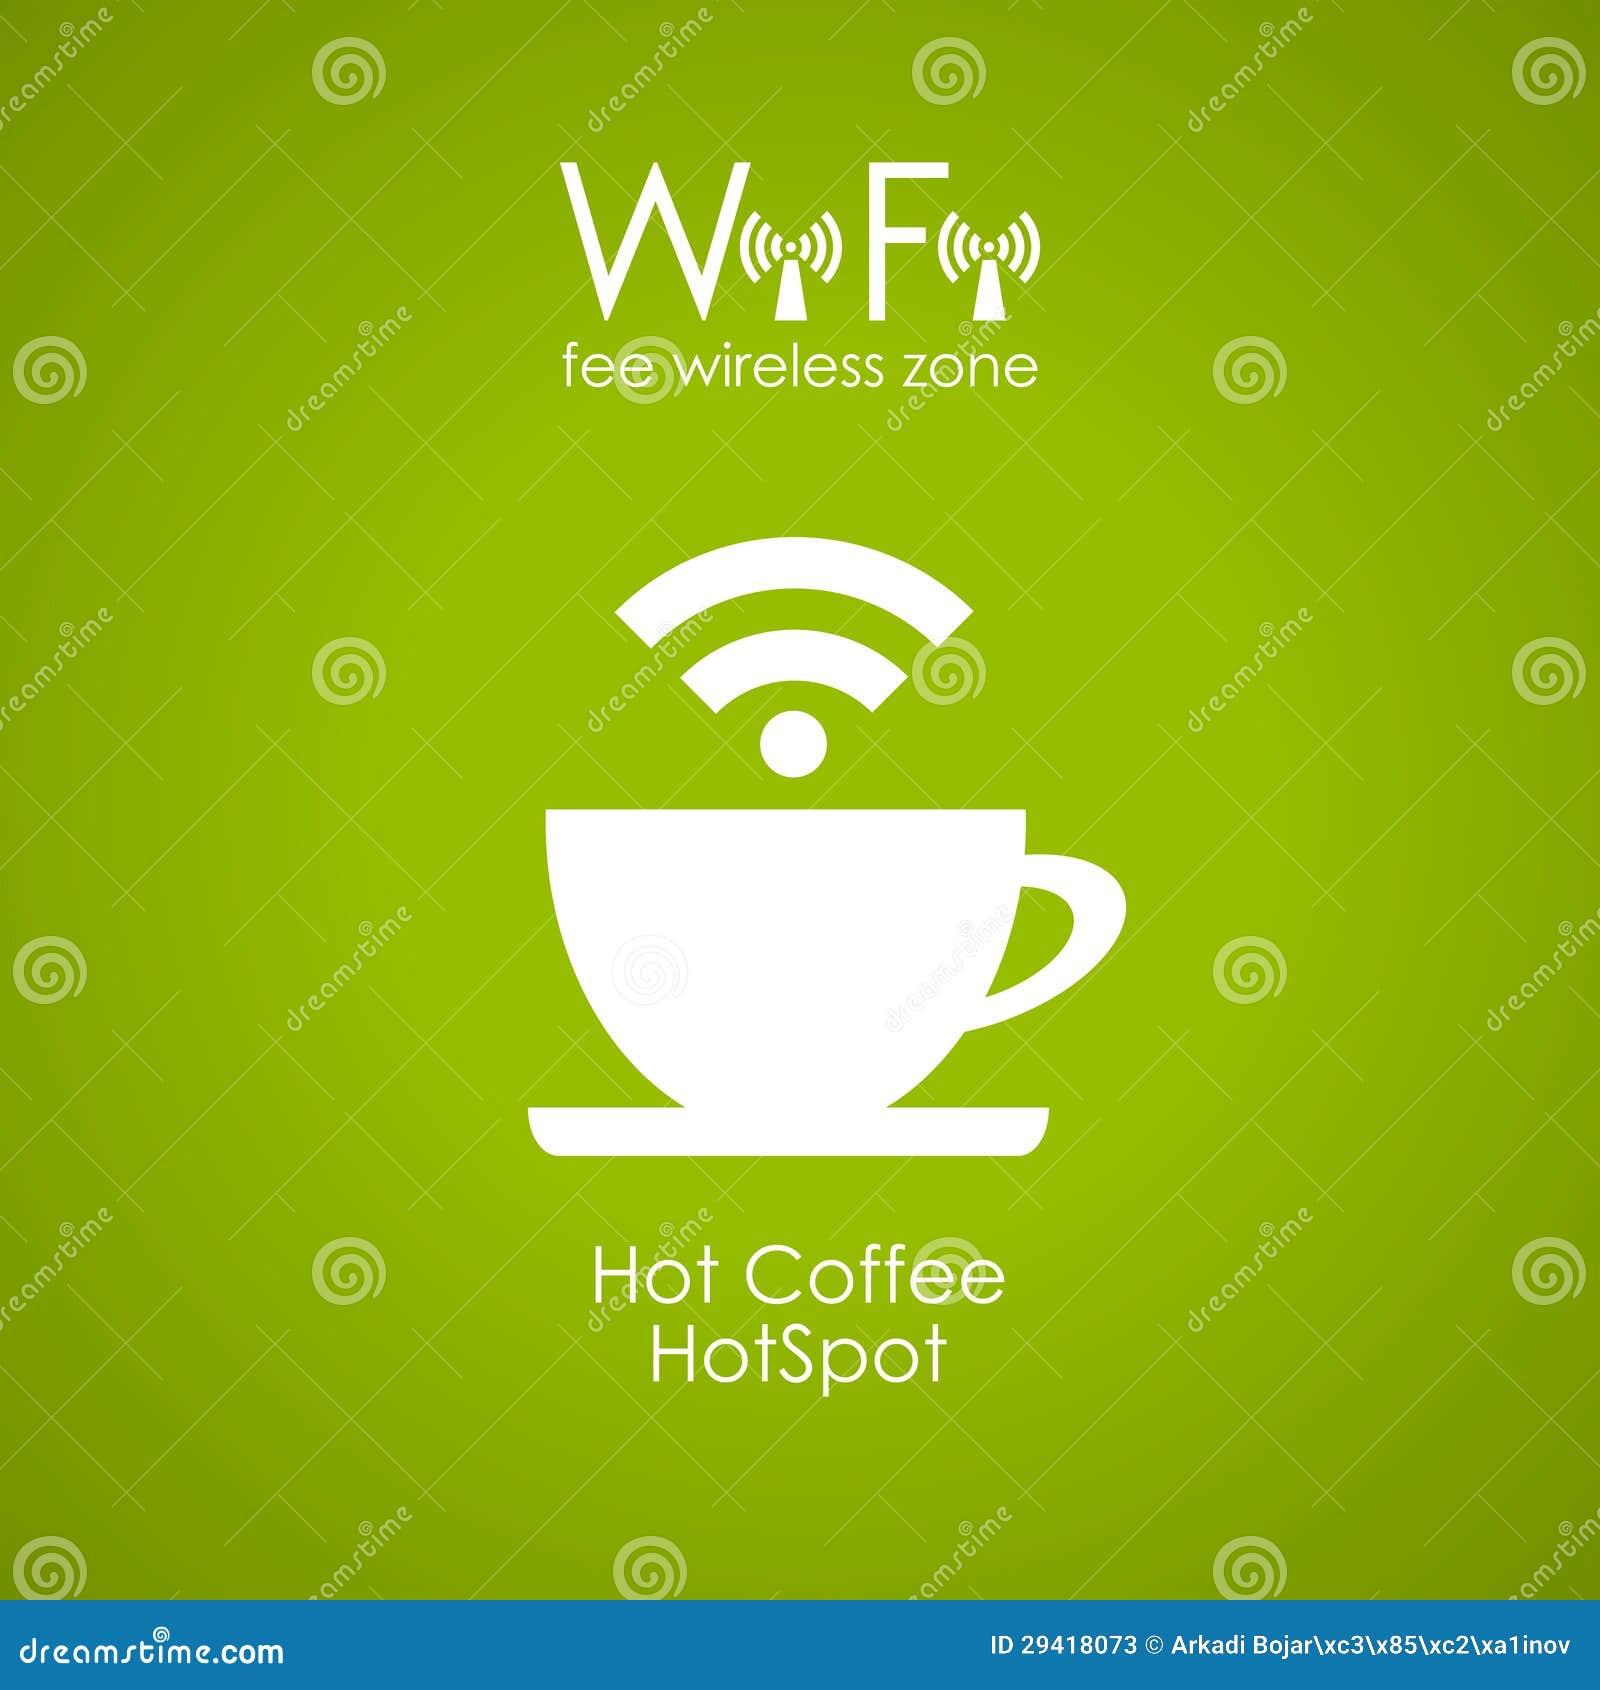 A Sample Internet Café Business Plan Template